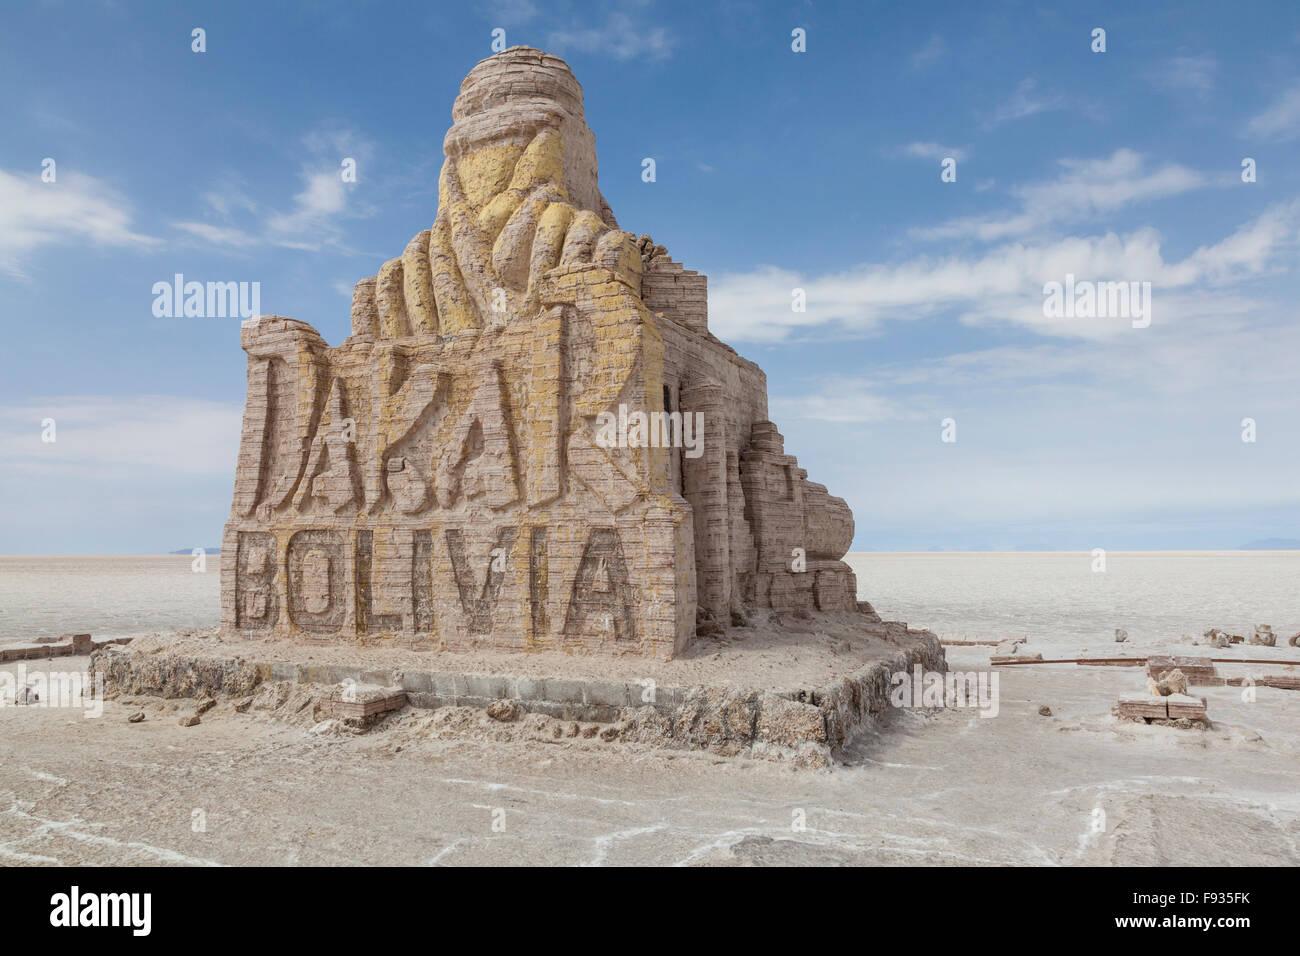 Salt Flats of Uyuni, Bolivia - Stock Image